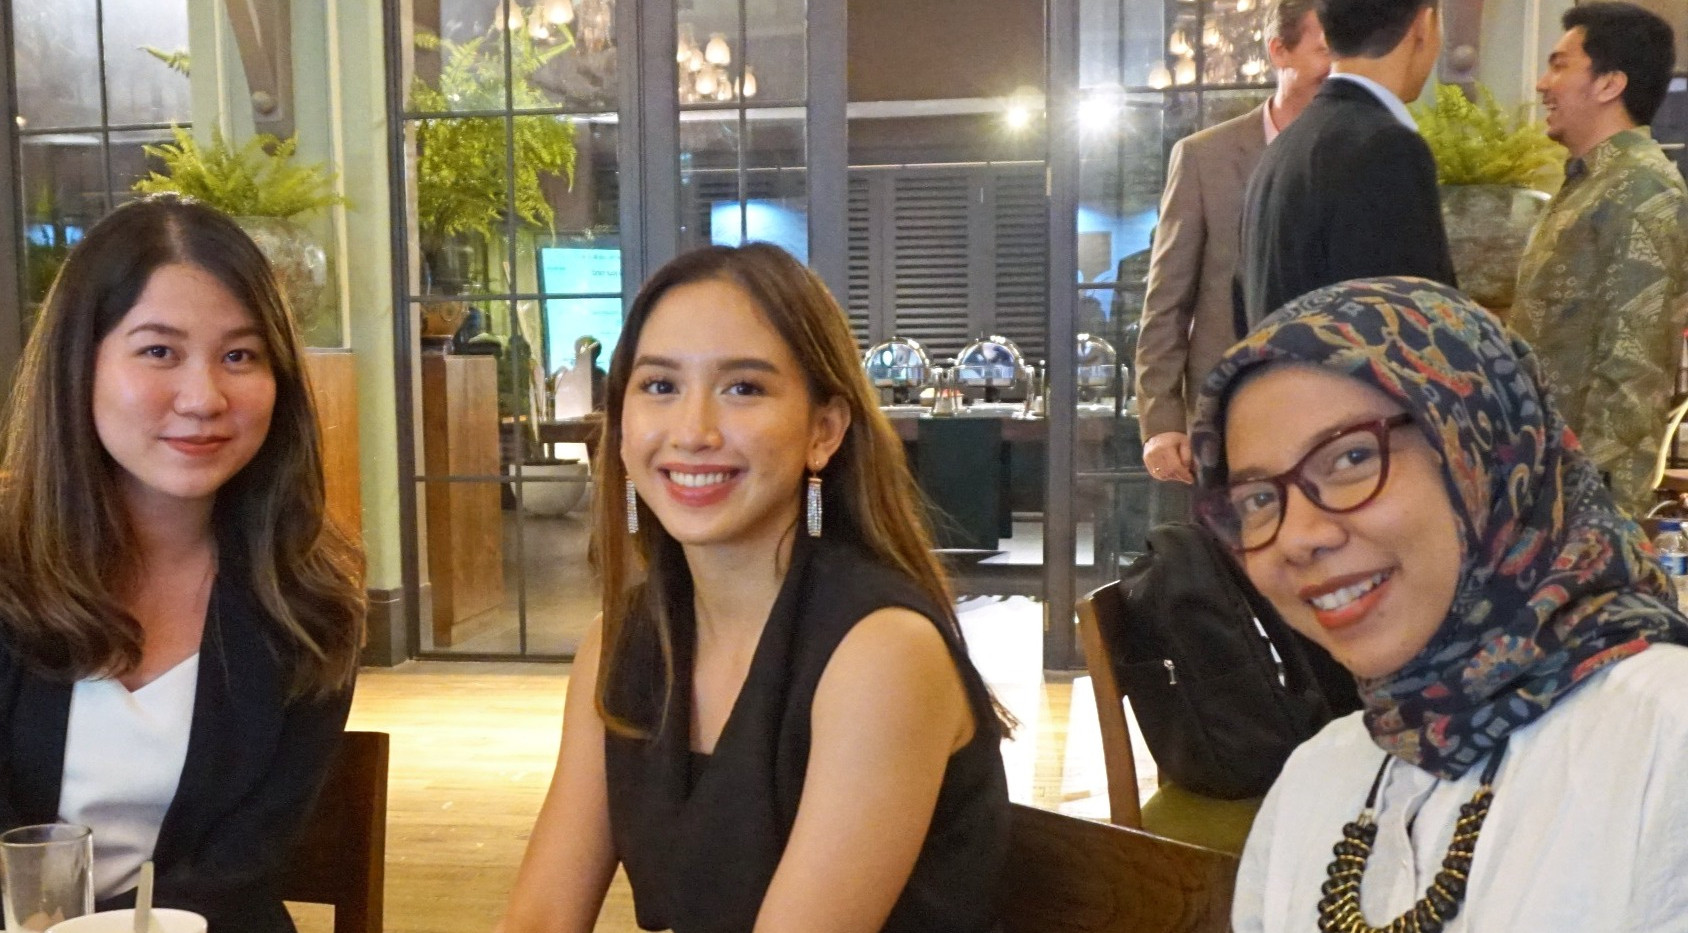 Dua perwakilan dari Japan Tobbaco International, Citra Tiara Pertama Rizki dan Saradeta Sinaga, yang juga merupakan salah satu pendukung CIPS, menghadiri Gala Dinner dan terlihat berdiskusi dengan peneliti kami, Galuh Octania.